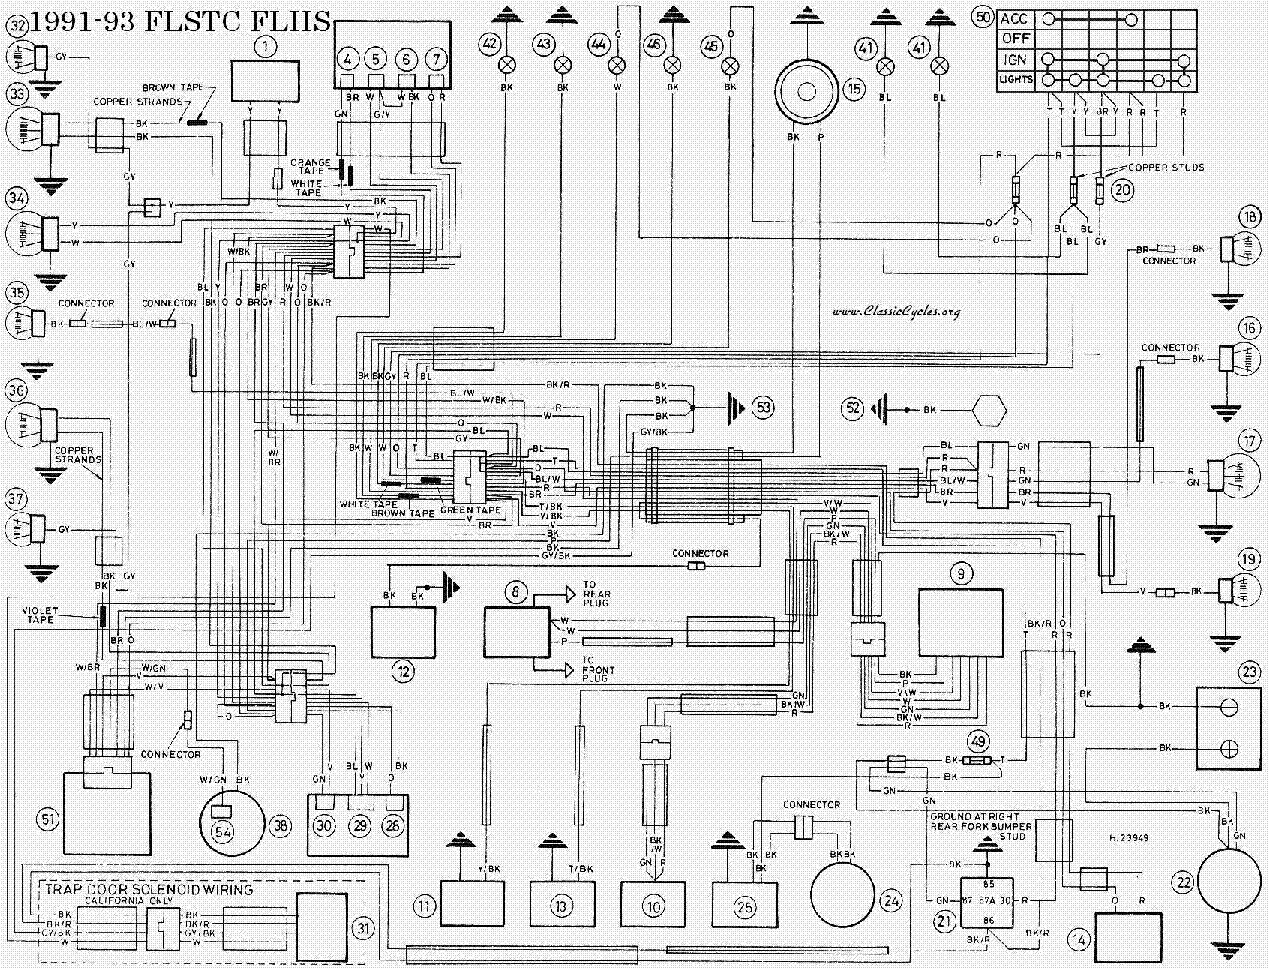 1992 Harley Davidson Ultra Glide Wiring Diagram | Online